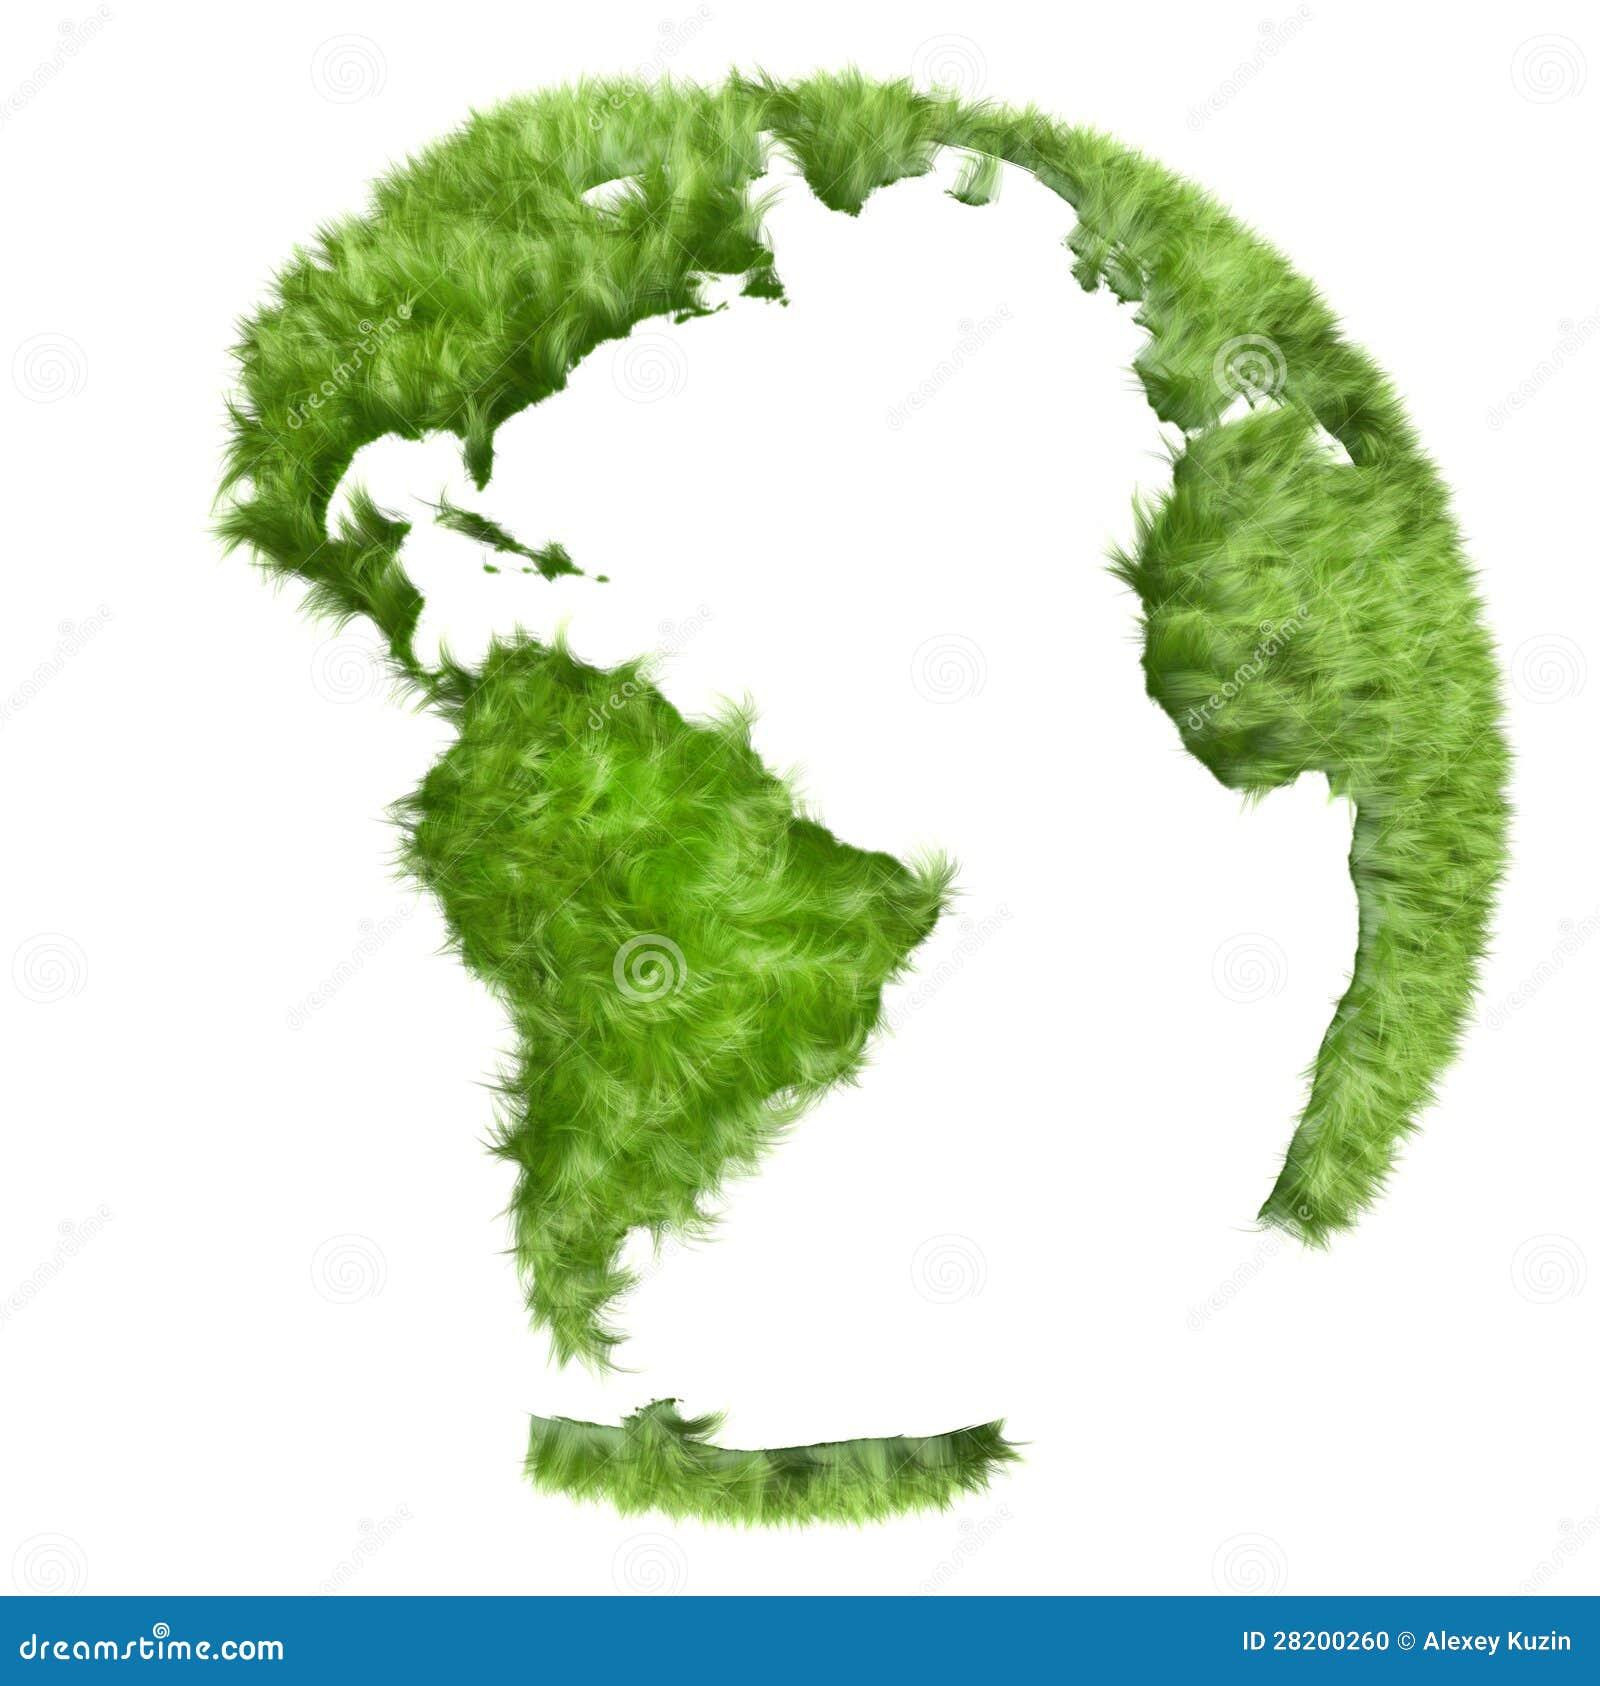 Green World Made Of Grass 3d Illustration Stock Illustration